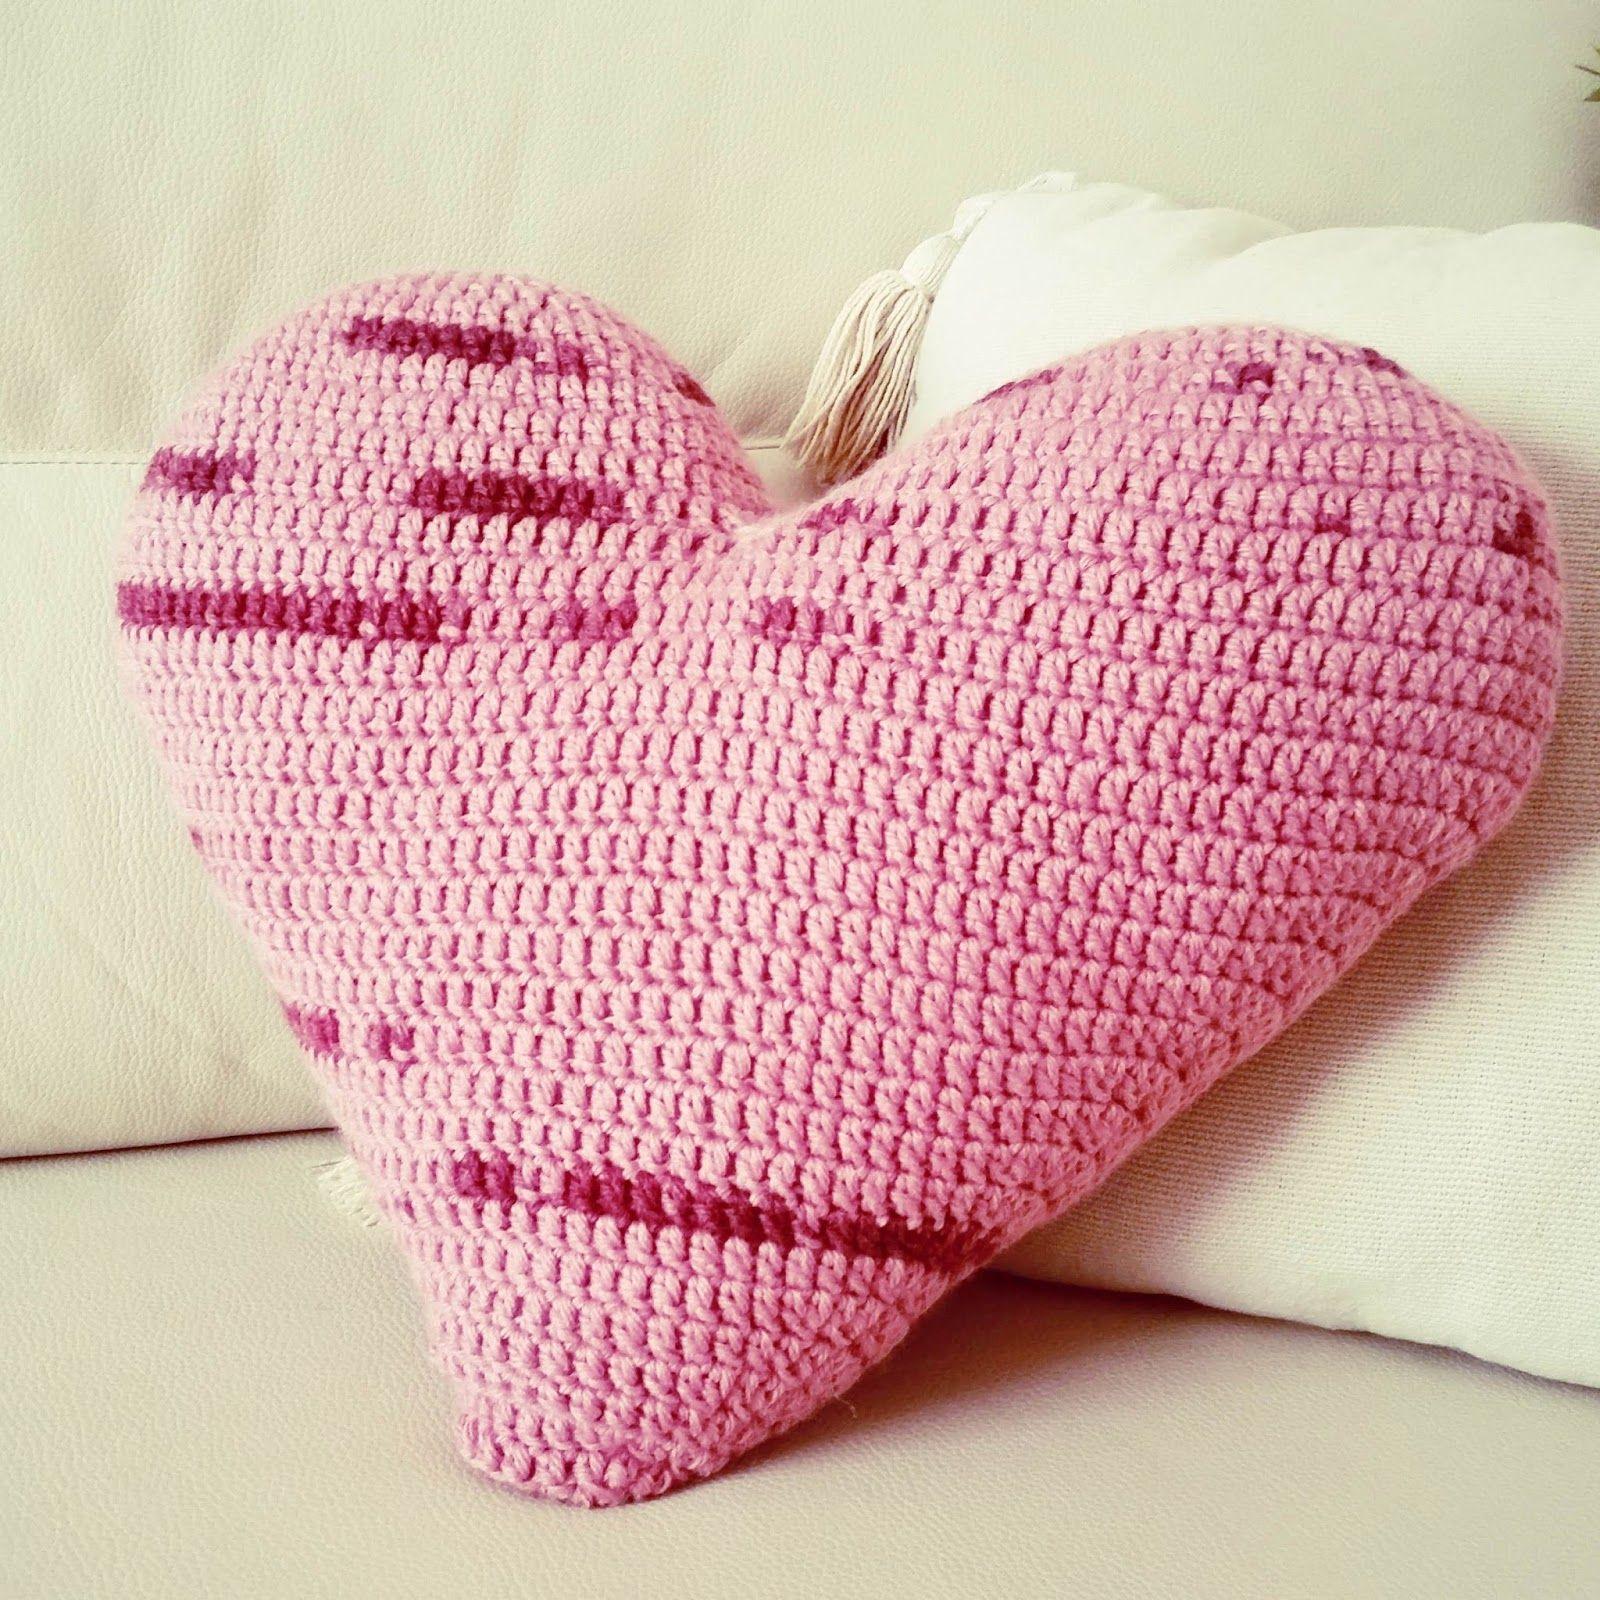 Como tejer un cojin de corazon a crochet o ganchillo for Cojines de trapillo